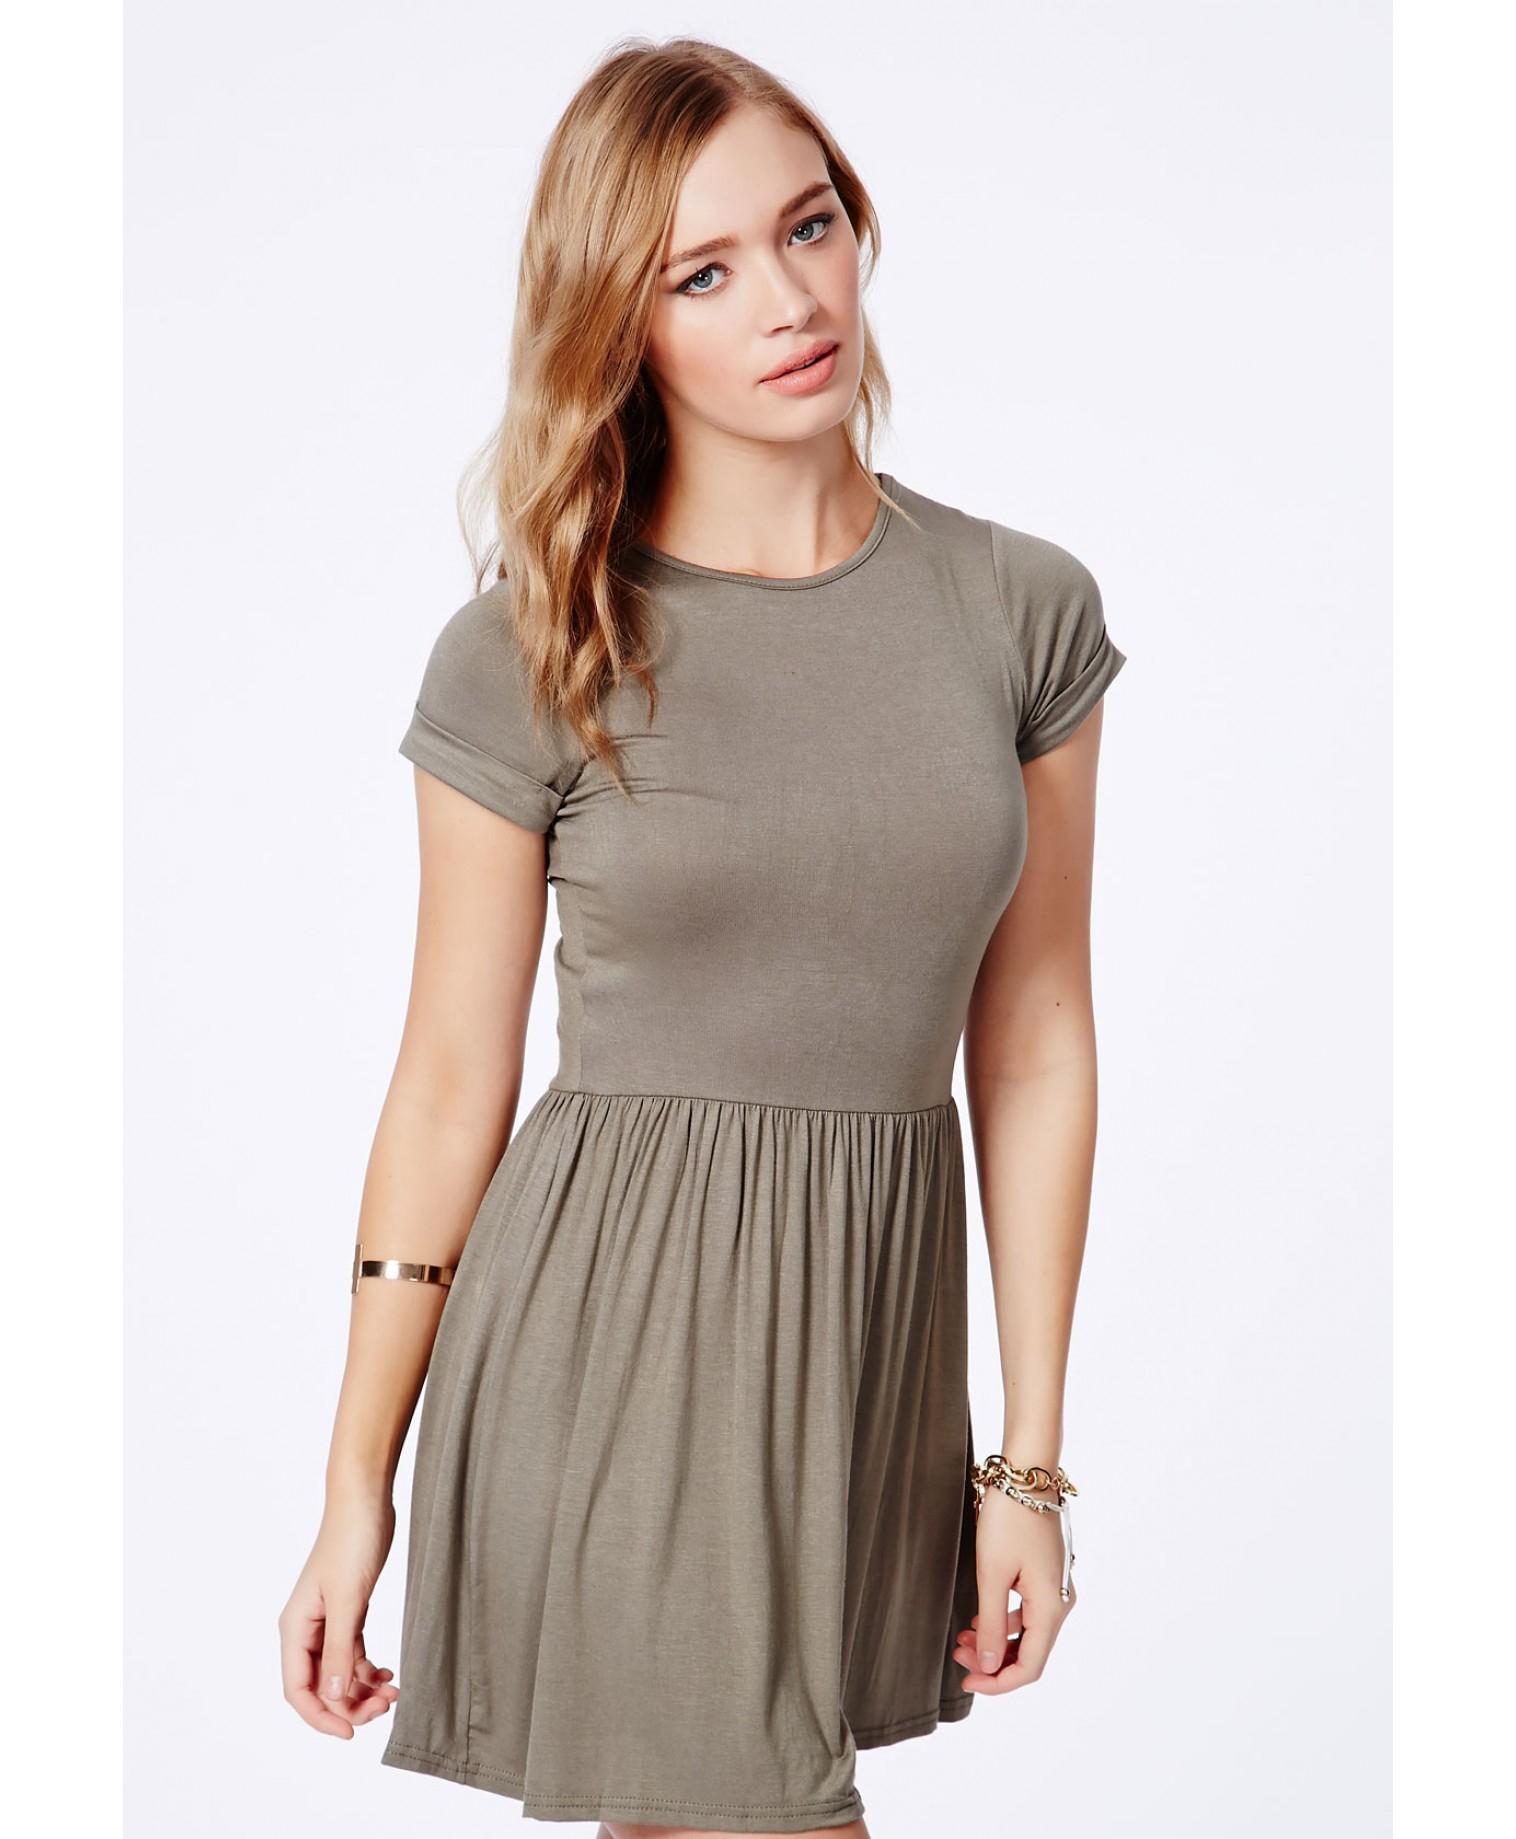 6d288a903e95 Missguided Aliveta Value Tshirt Skater Dress in Khaki in Green - Lyst